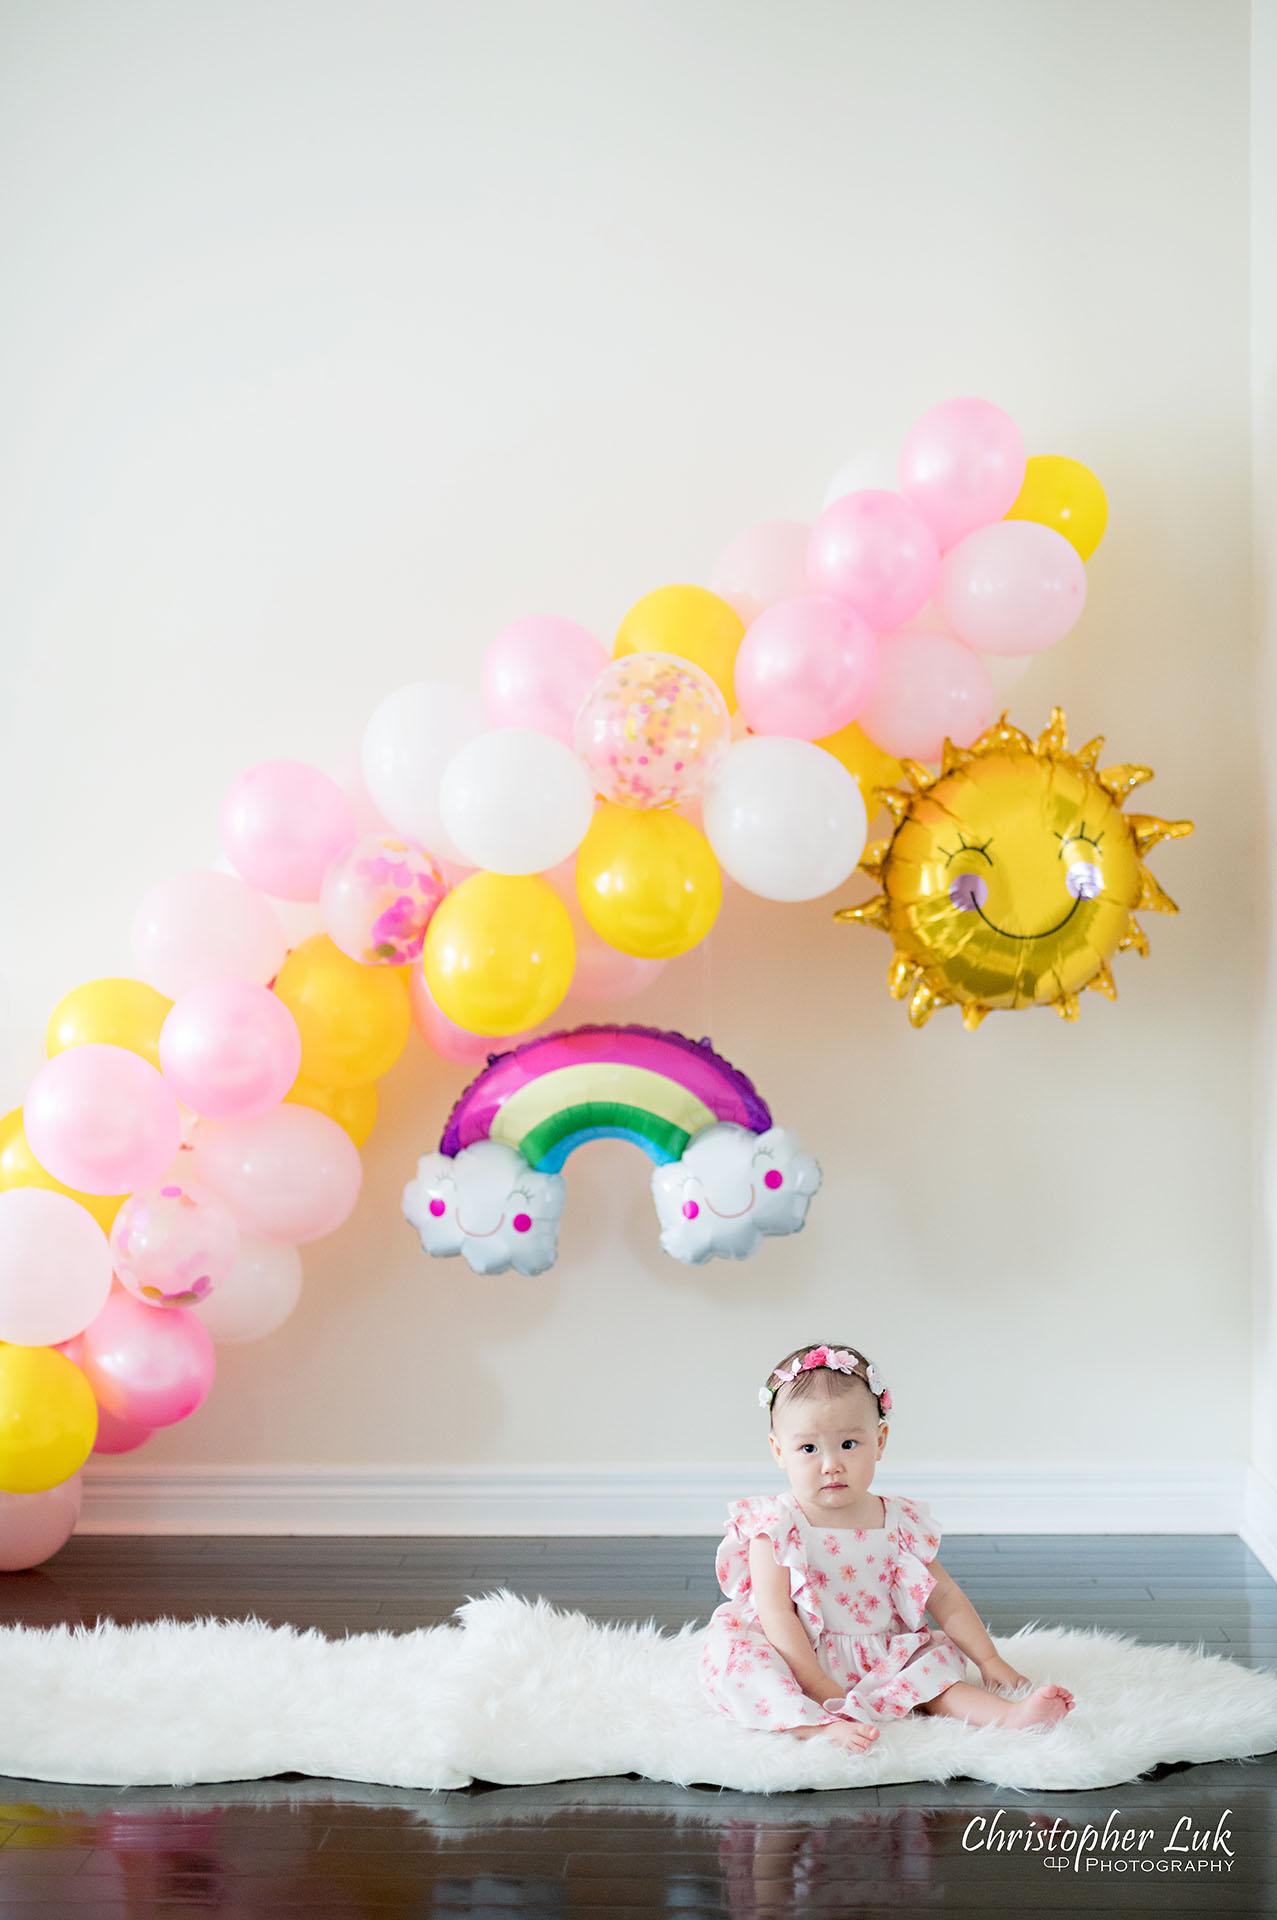 Christopher Luk Toronto Markham Family Photographer Baby Girl First Birthday Balloon Arch Rainbow Pink Sun White Fuzzy Fur Rug Mat Natural Candid Photojournalistic Portrait